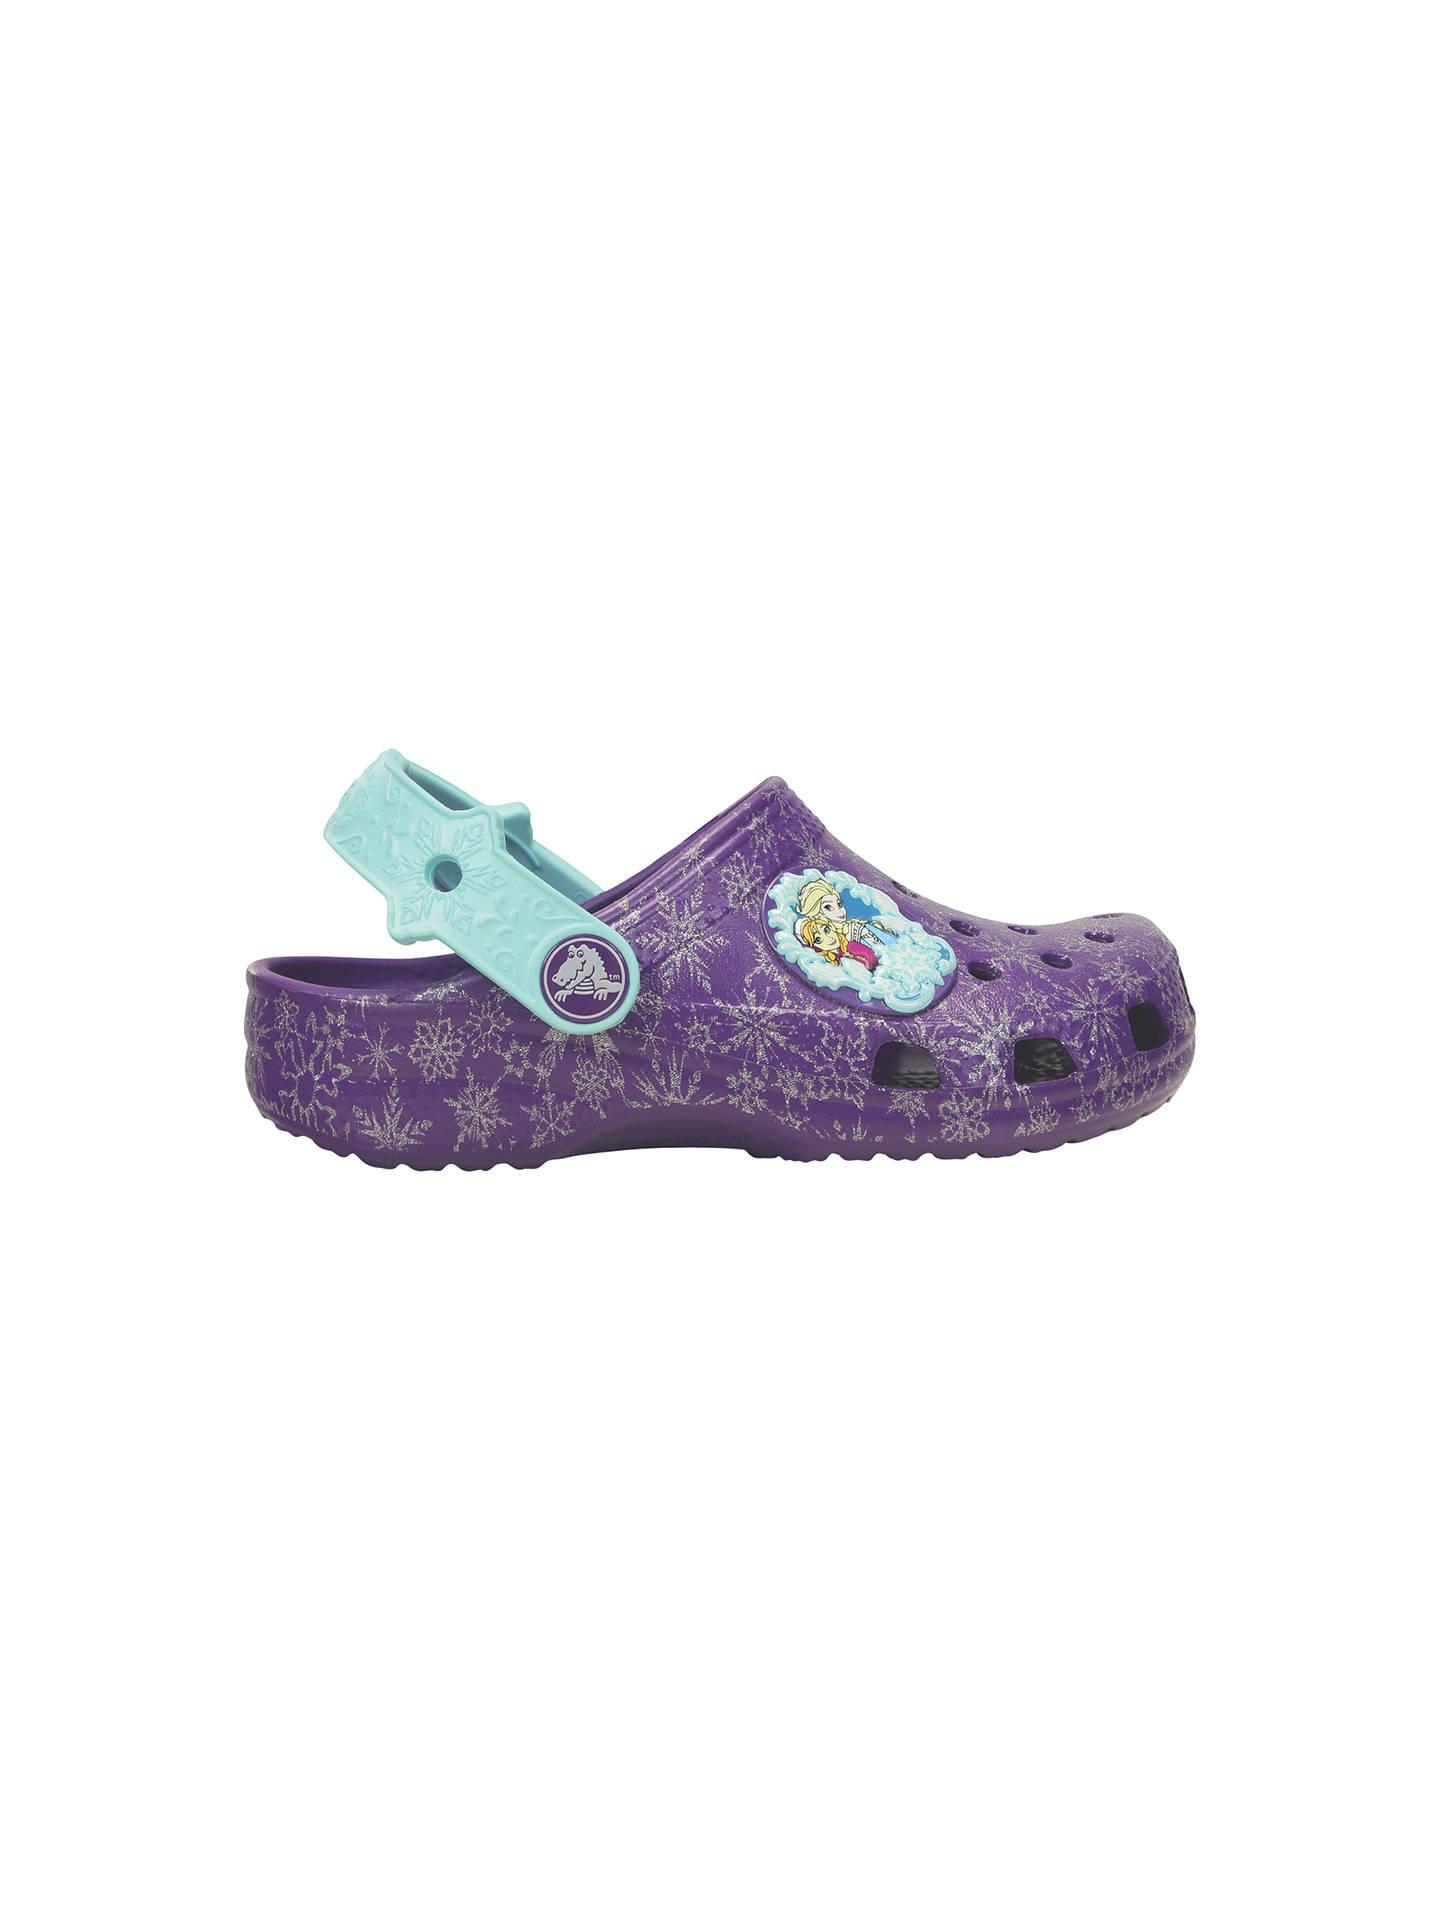 7bc7b7b64f4232 Buy Crocs Children s Classic Disney Frozen Clogs